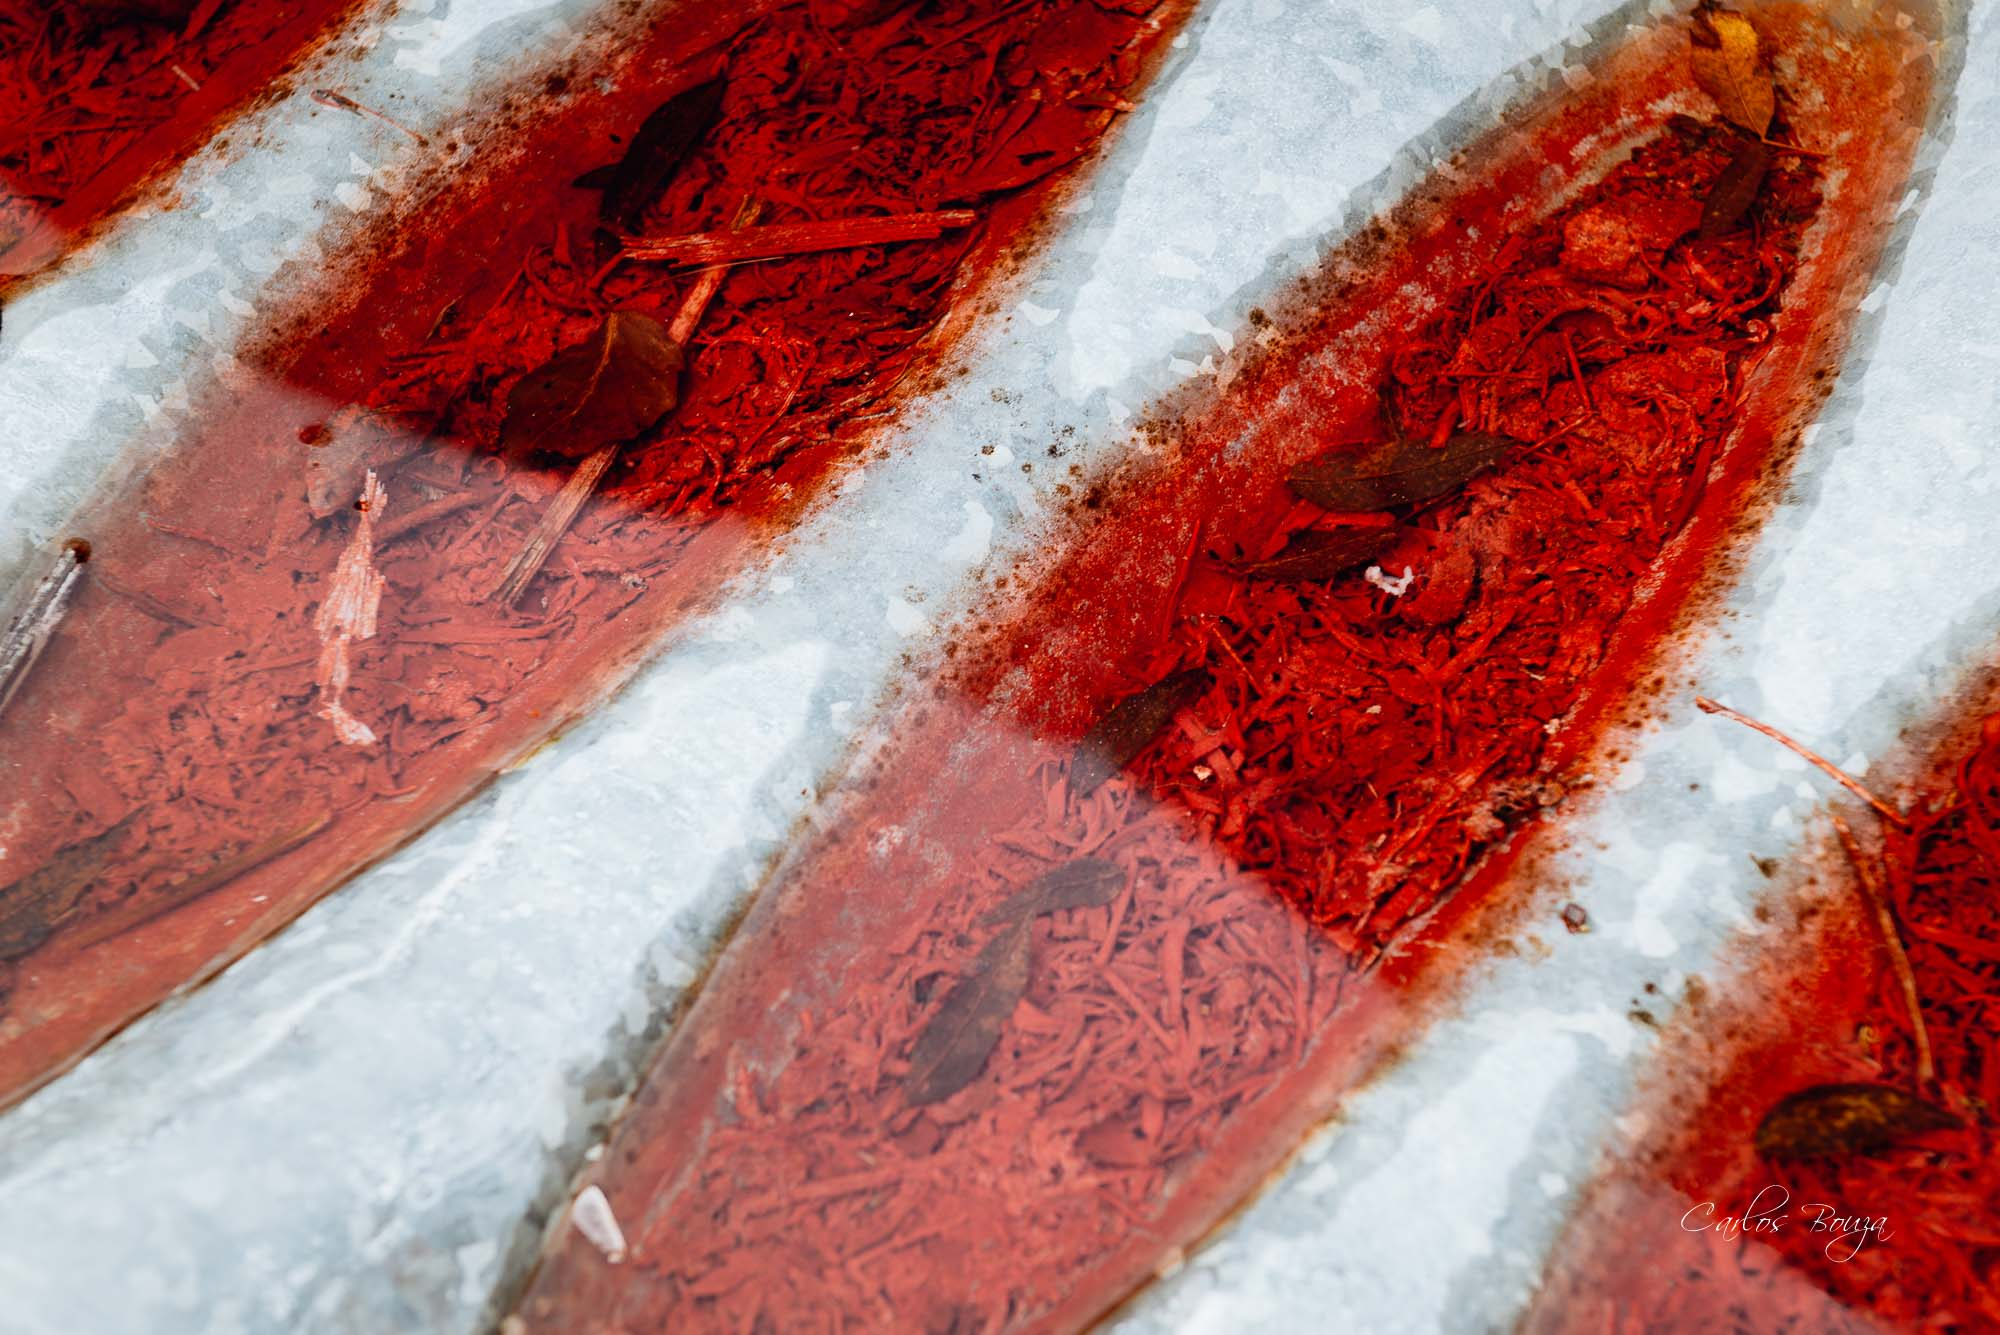 Hielo rojo